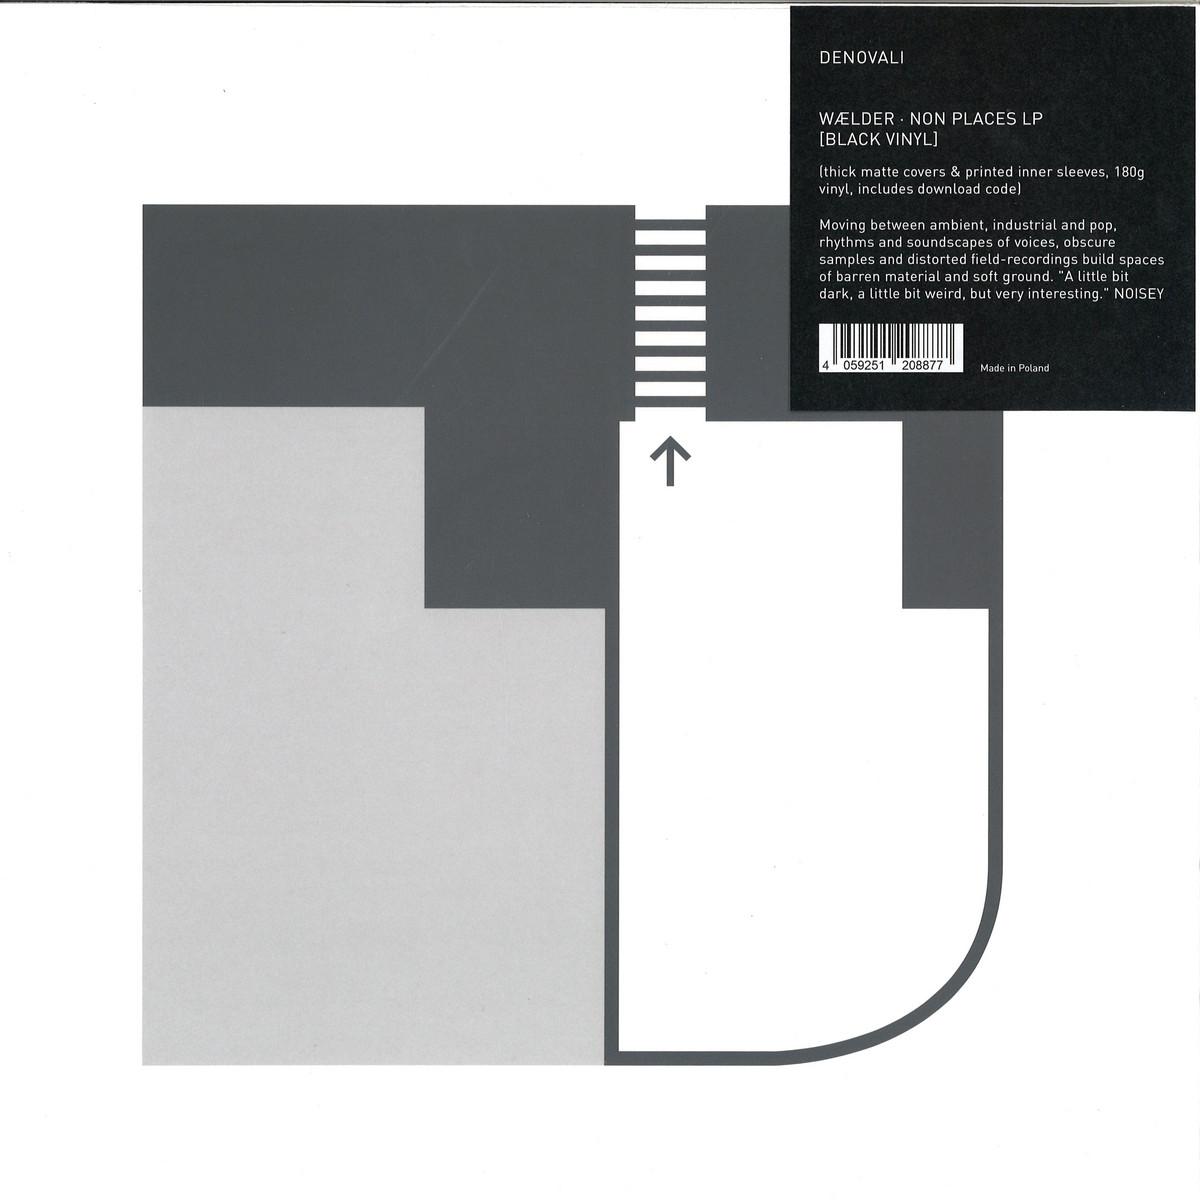 Wälder - Non Places / Denovali DEN293LP - Vinyl